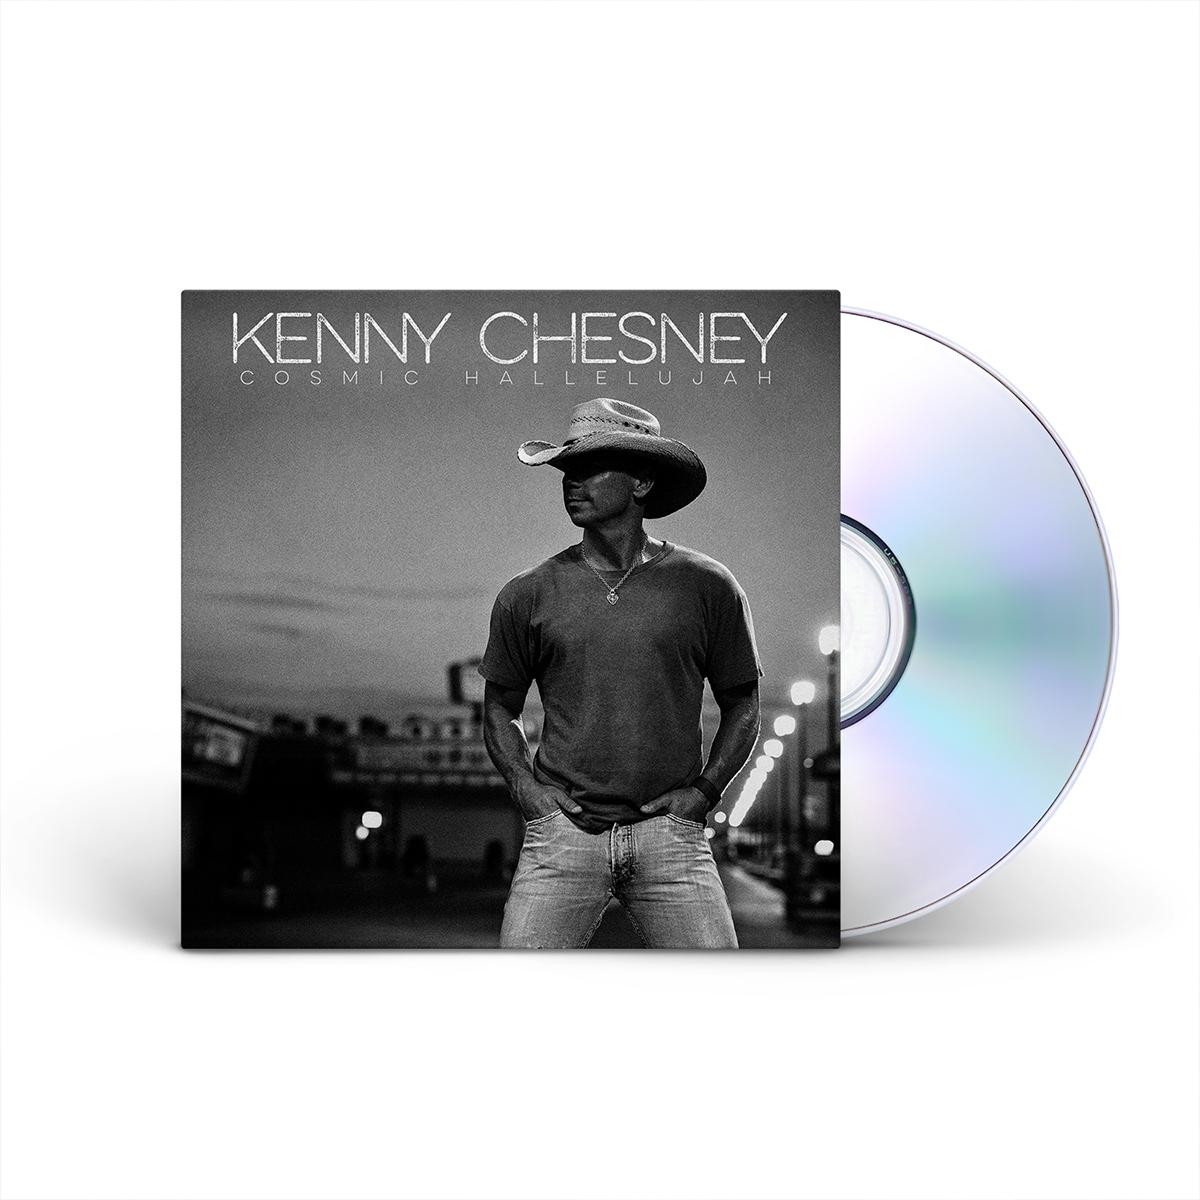 Kenny Chesney - Cosmic Hallelujah CD